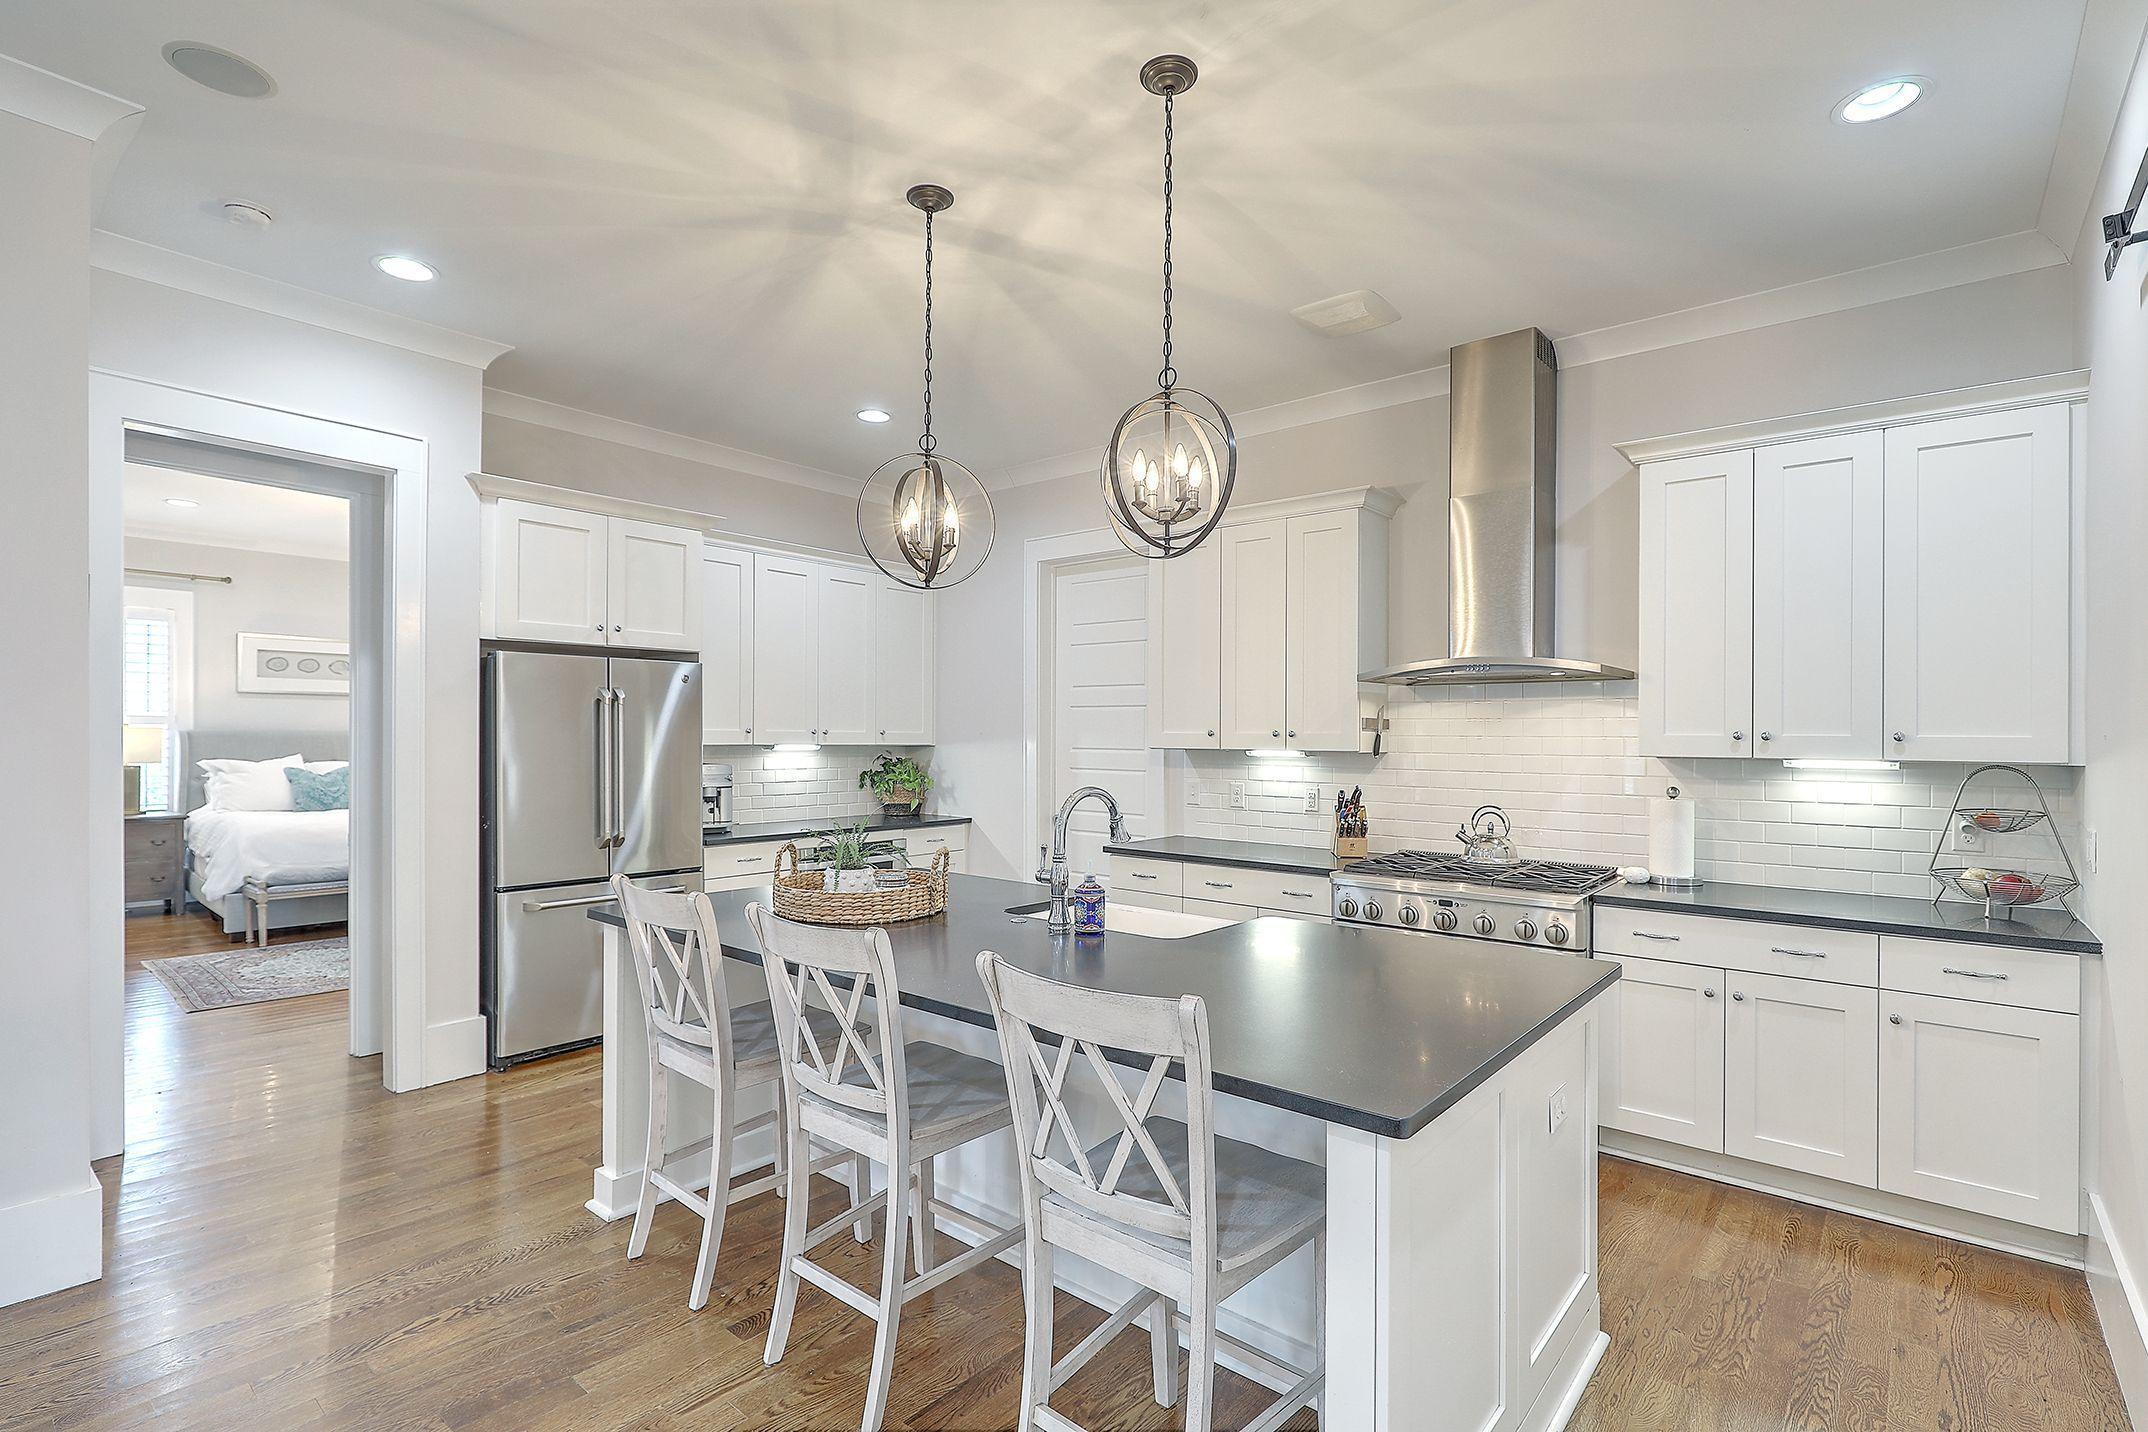 Carolina Park Homes For Sale - 1466 Gunnison, Mount Pleasant, SC - 13